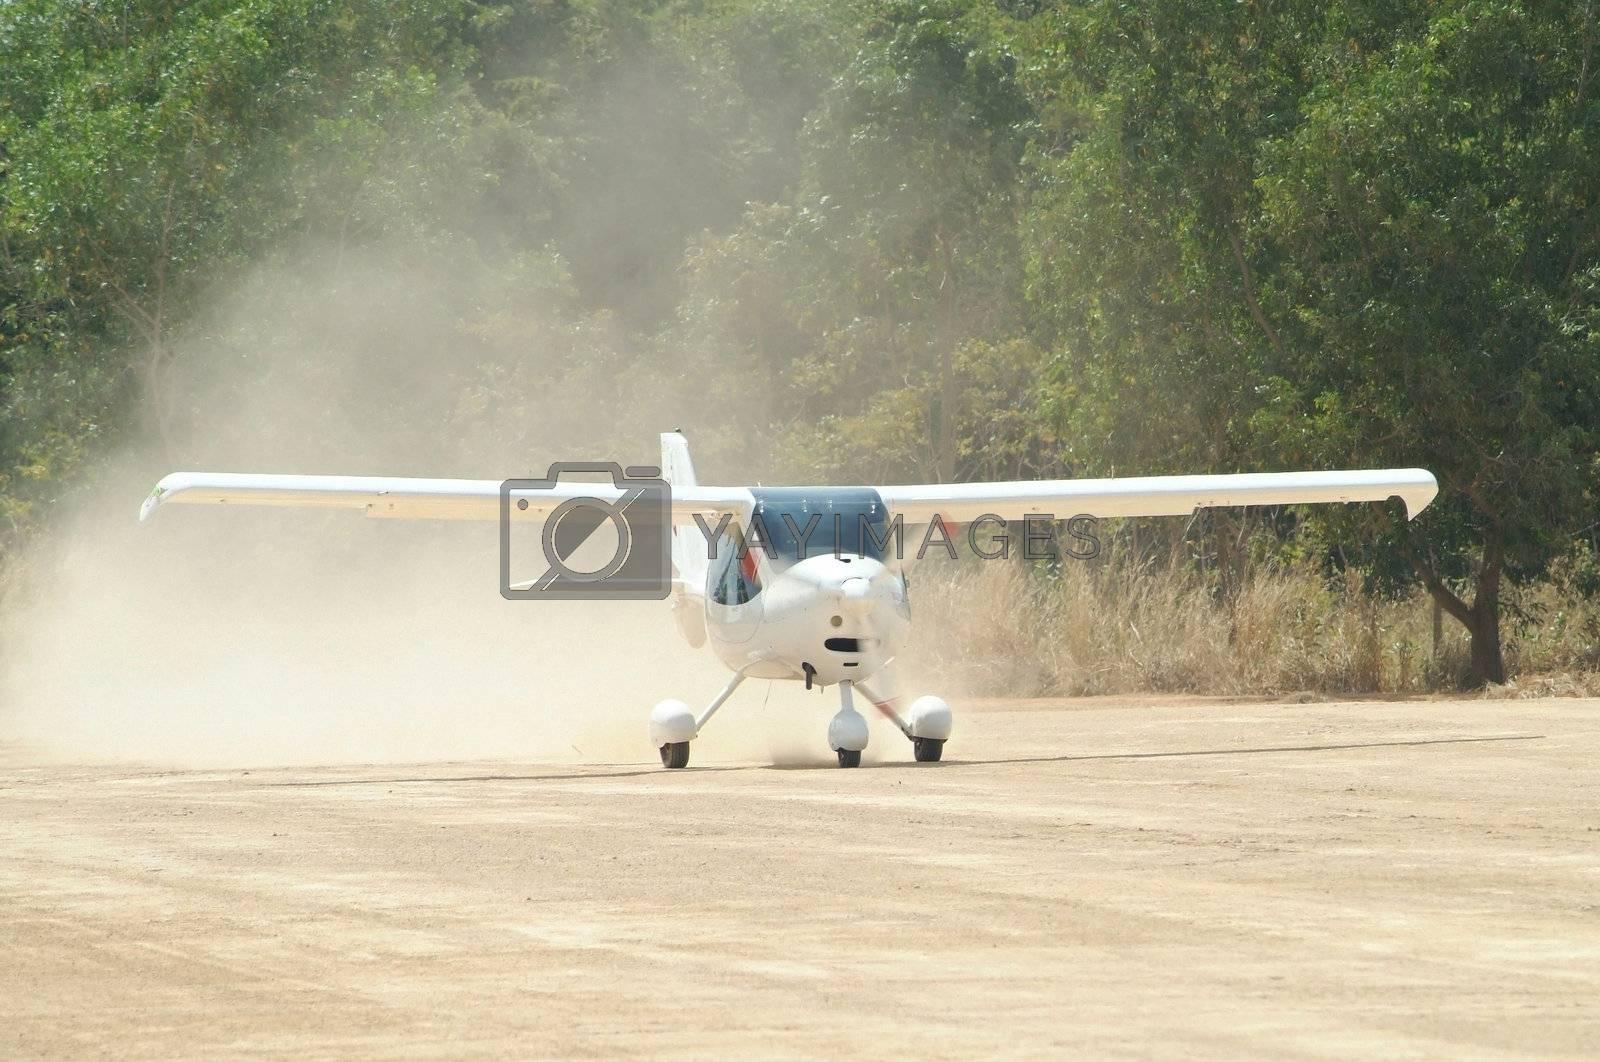 Small, white airplane by epixx